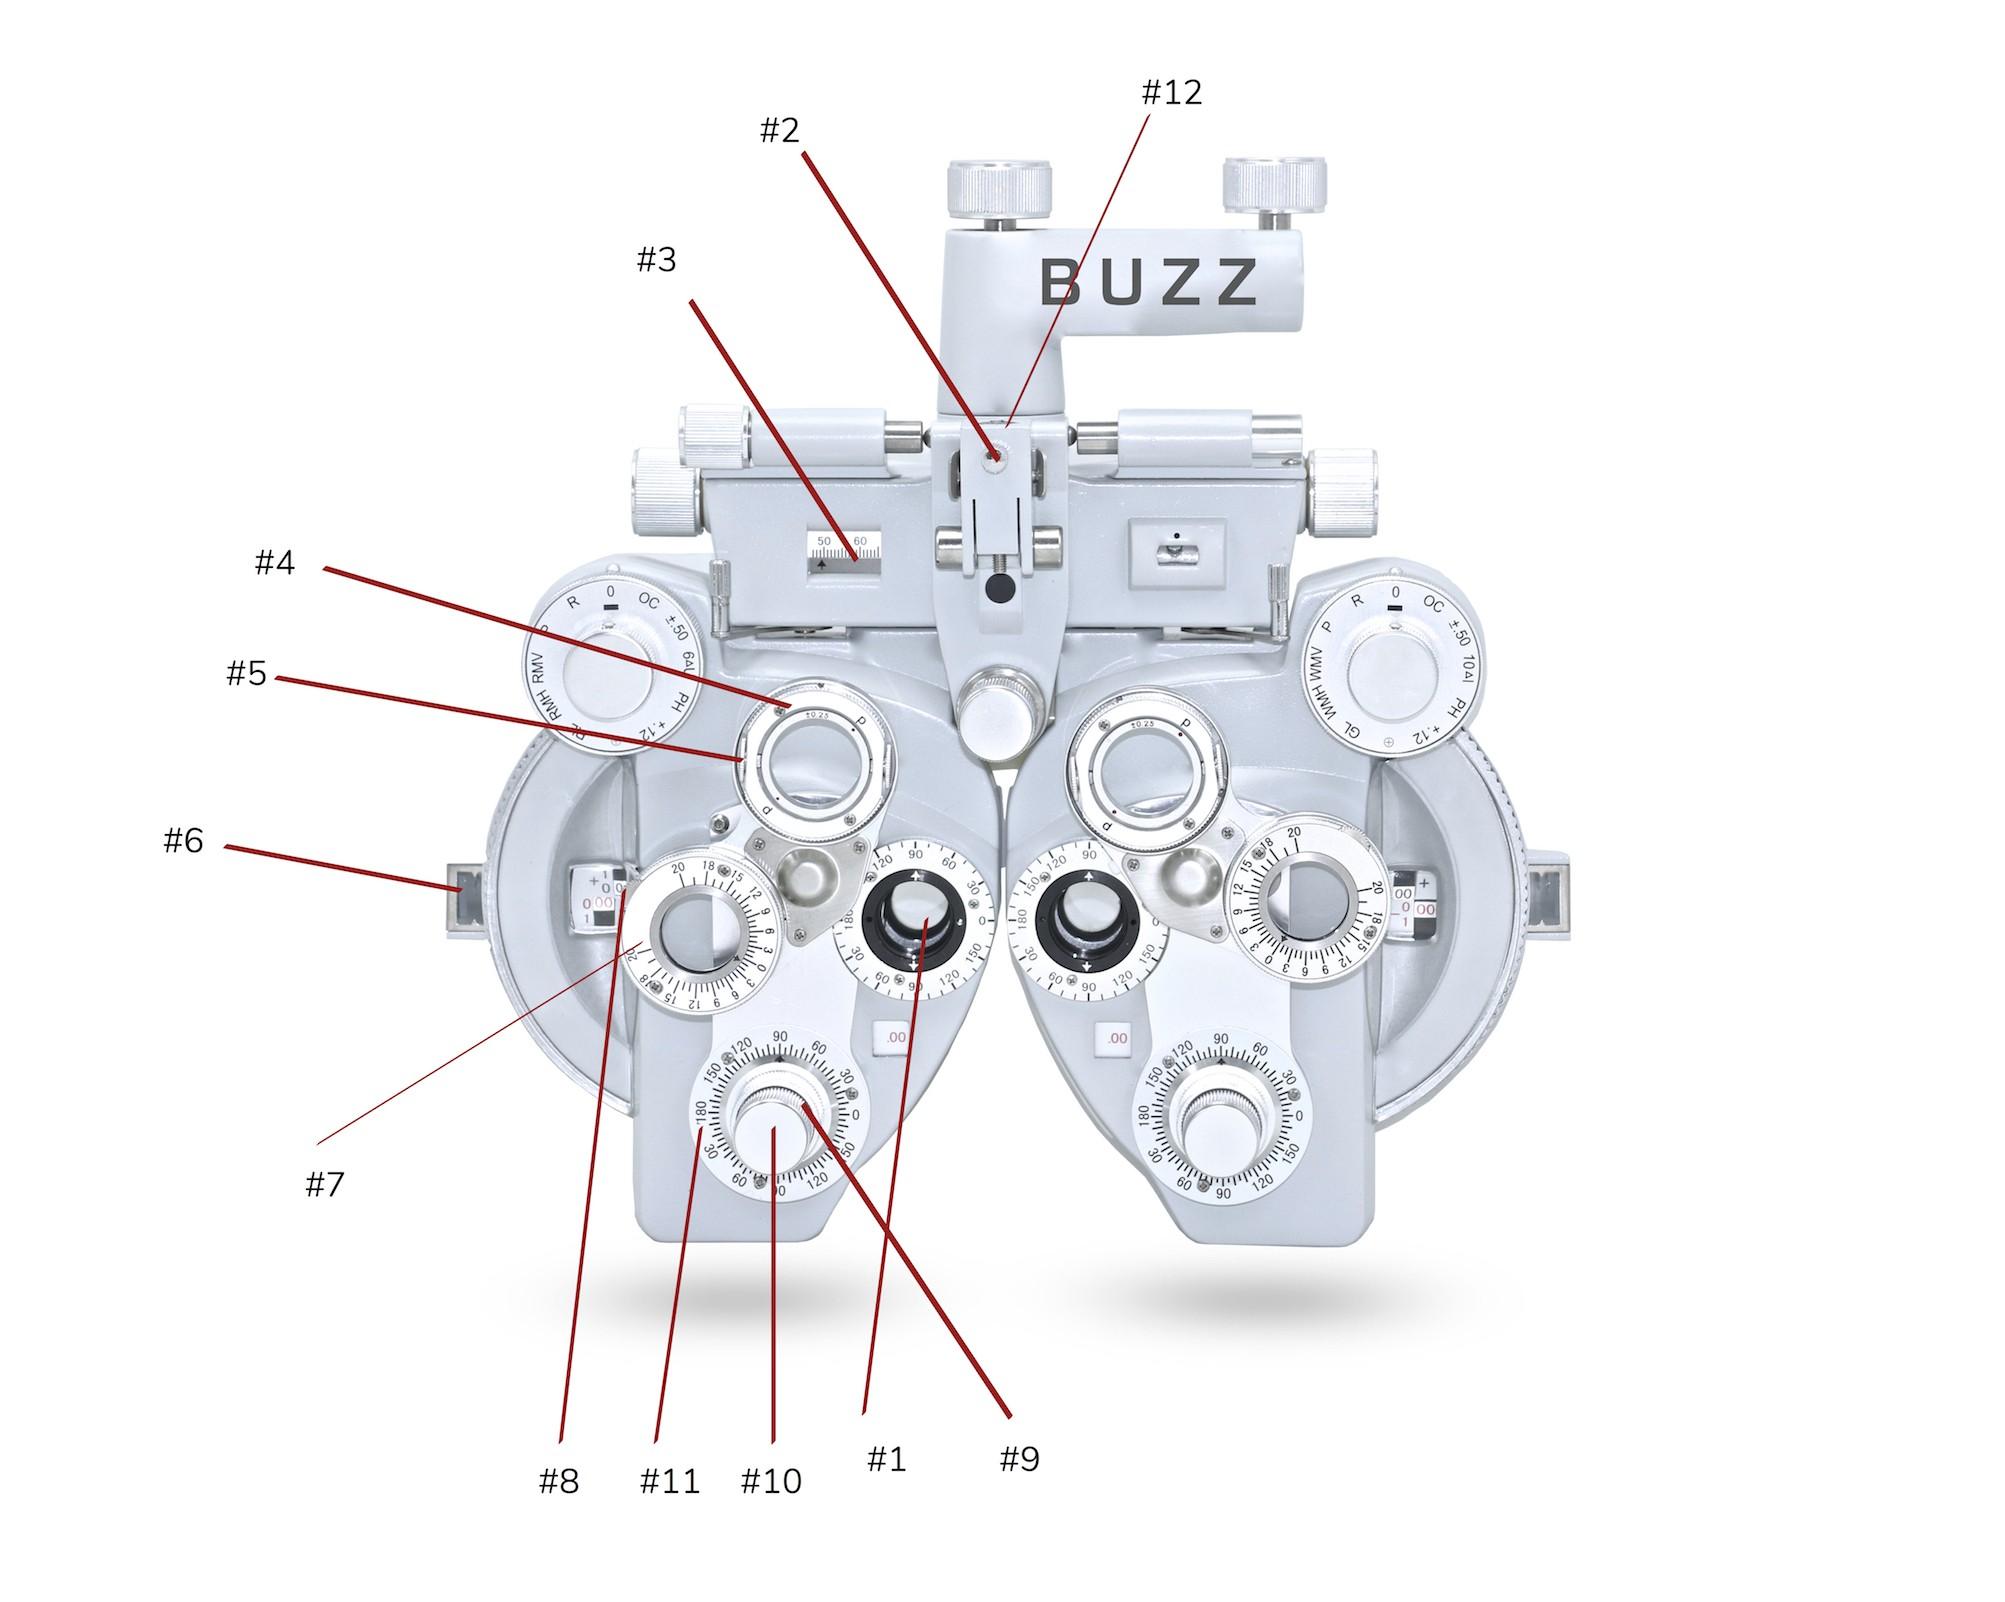 Funky Labeled Car Parts Pattern - Wiring Diagram Ideas - blogitia.com